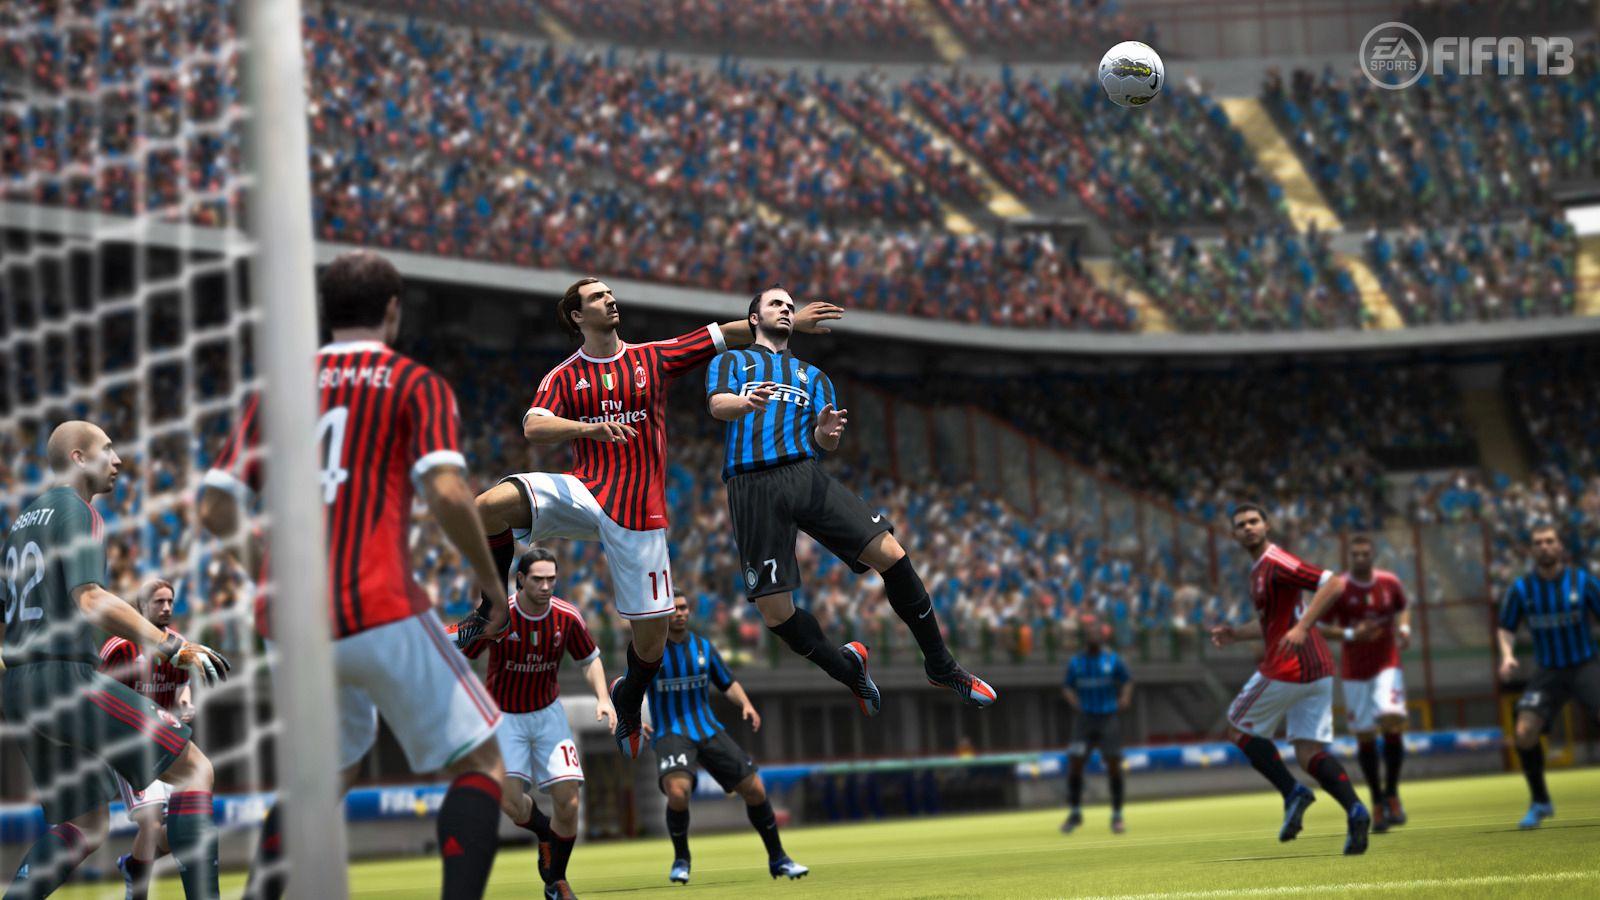 Zlatan i aksjon i FIFA 13.Foto: EA Sports